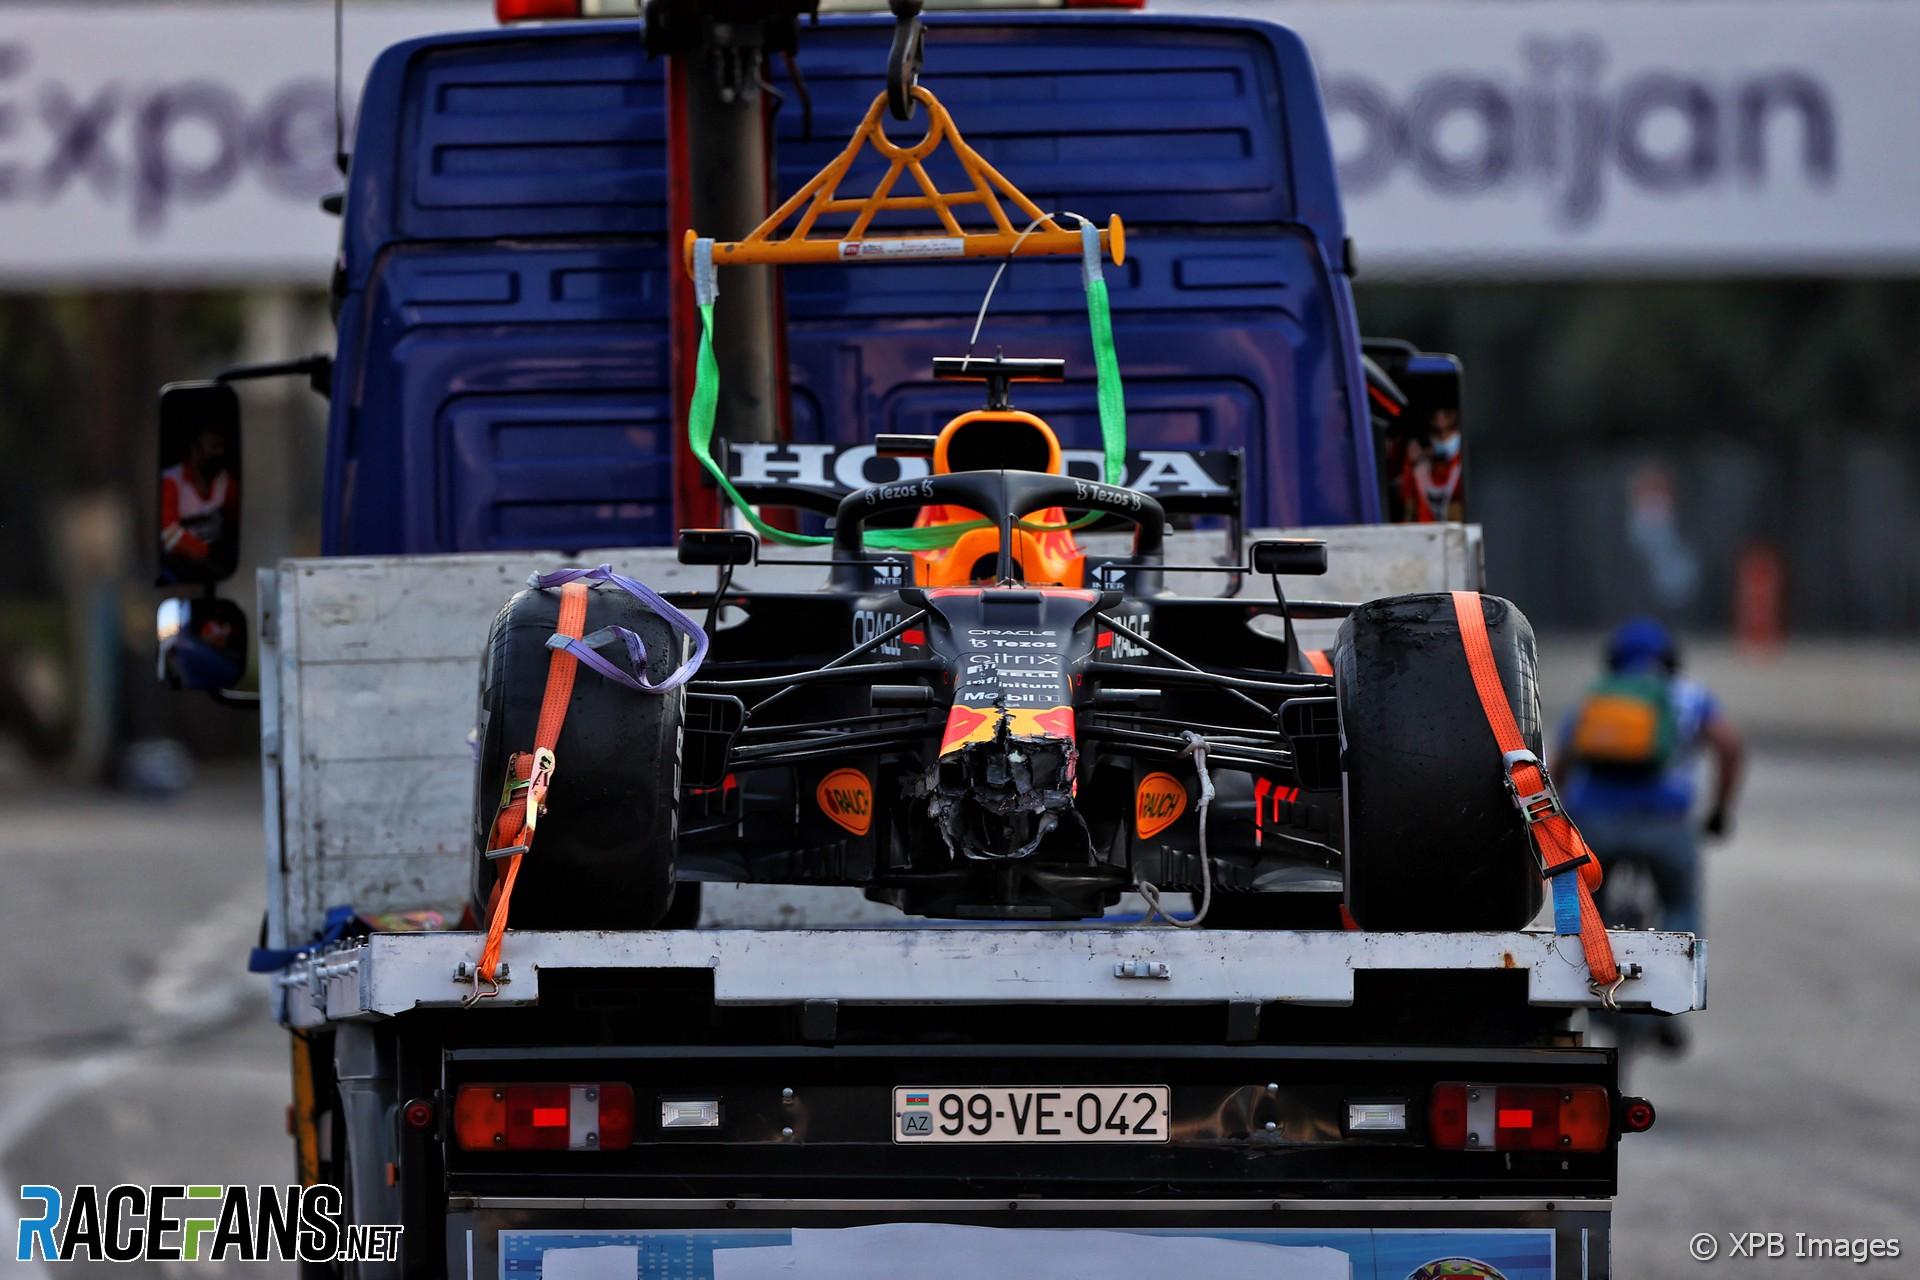 Max Verstappen, Red Bull, Baku City Circuit, 2021